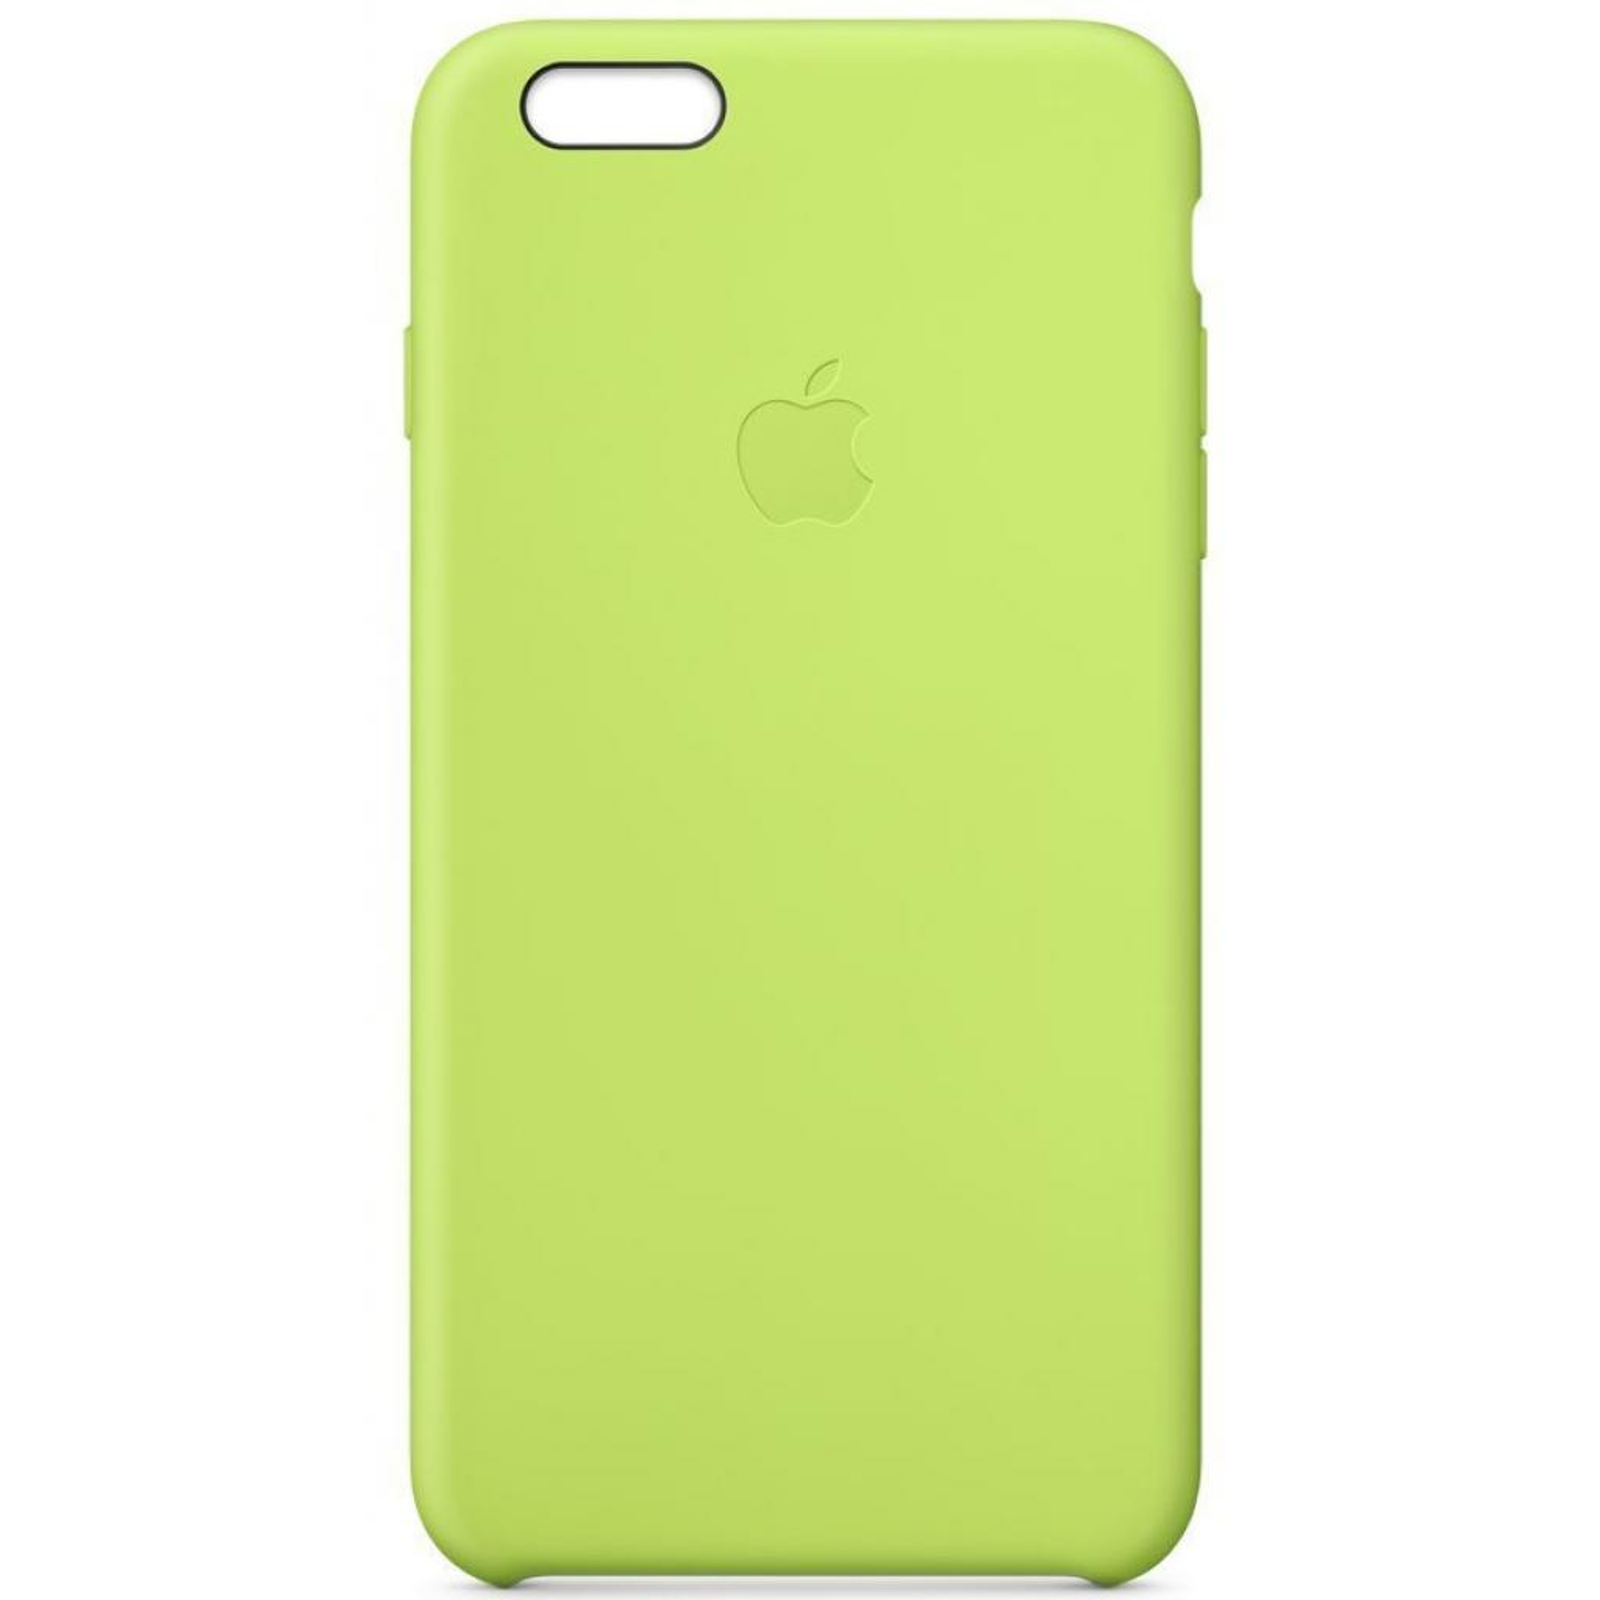 Чехол для моб. телефона Apple для iPhone 6 Plus green (MGXX2ZM/A)